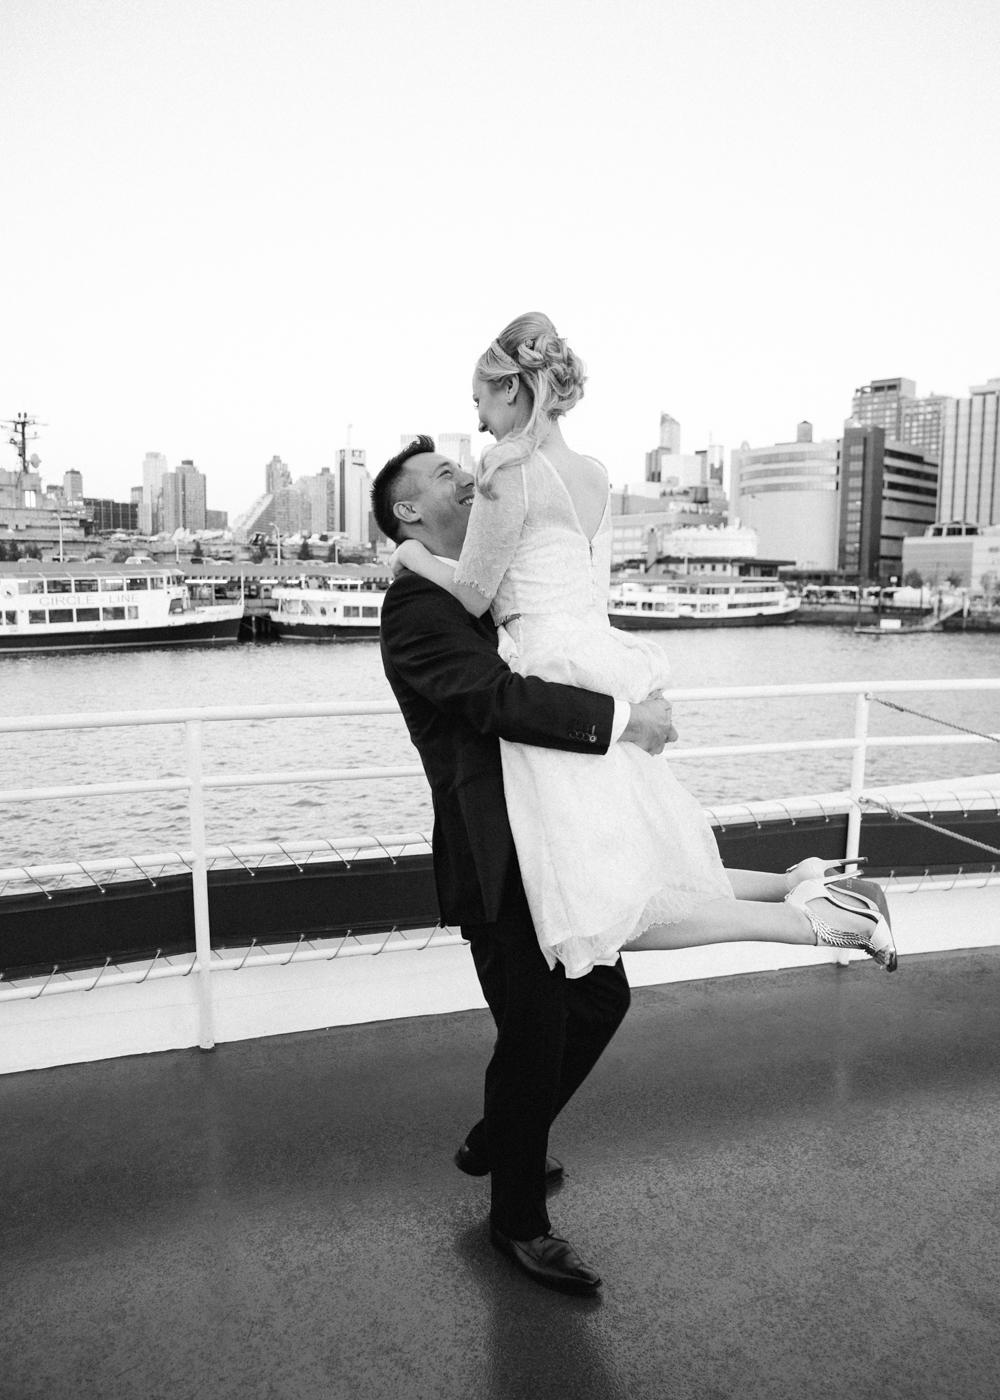 Wedding_photography_by_Tanya_Isaeva-16.jpg